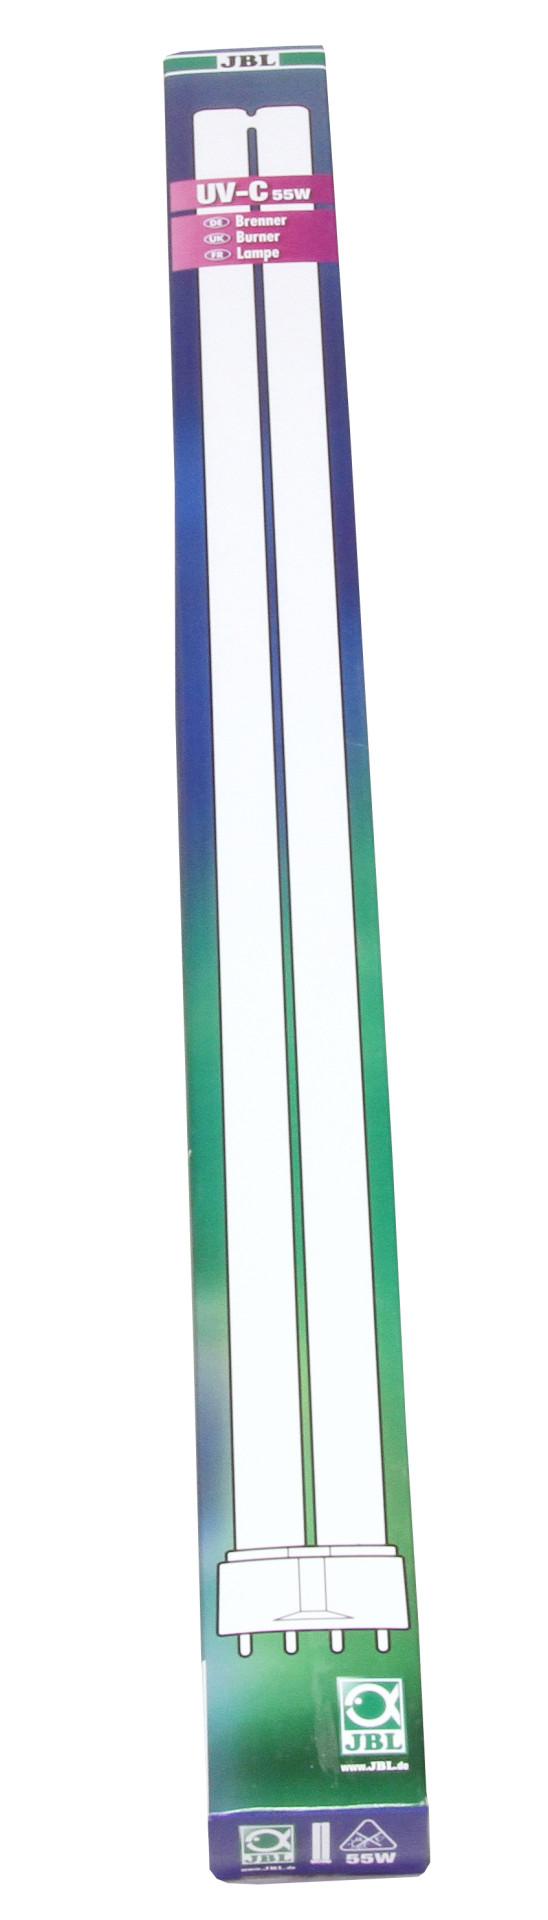 JBL vervanglamp UV-C 55 watt